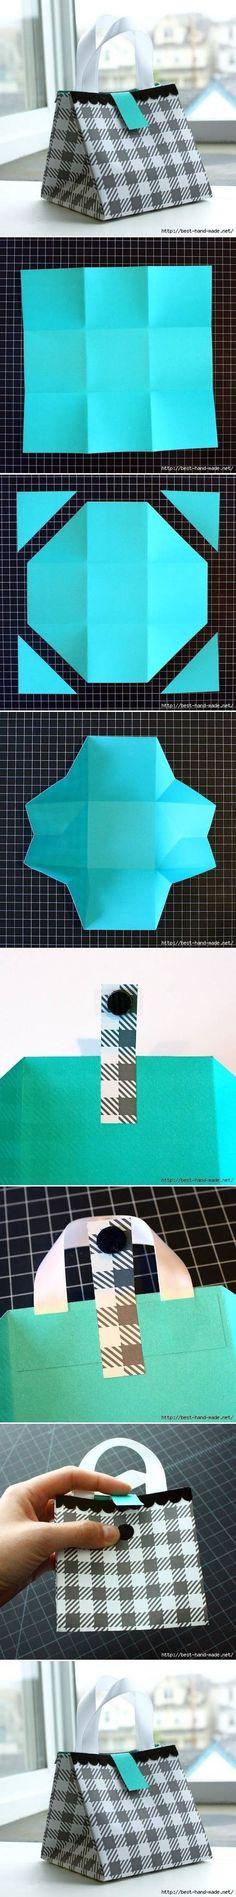 DIY Nice Paper Gift Bag DIY Projects / UsefulDIY.com